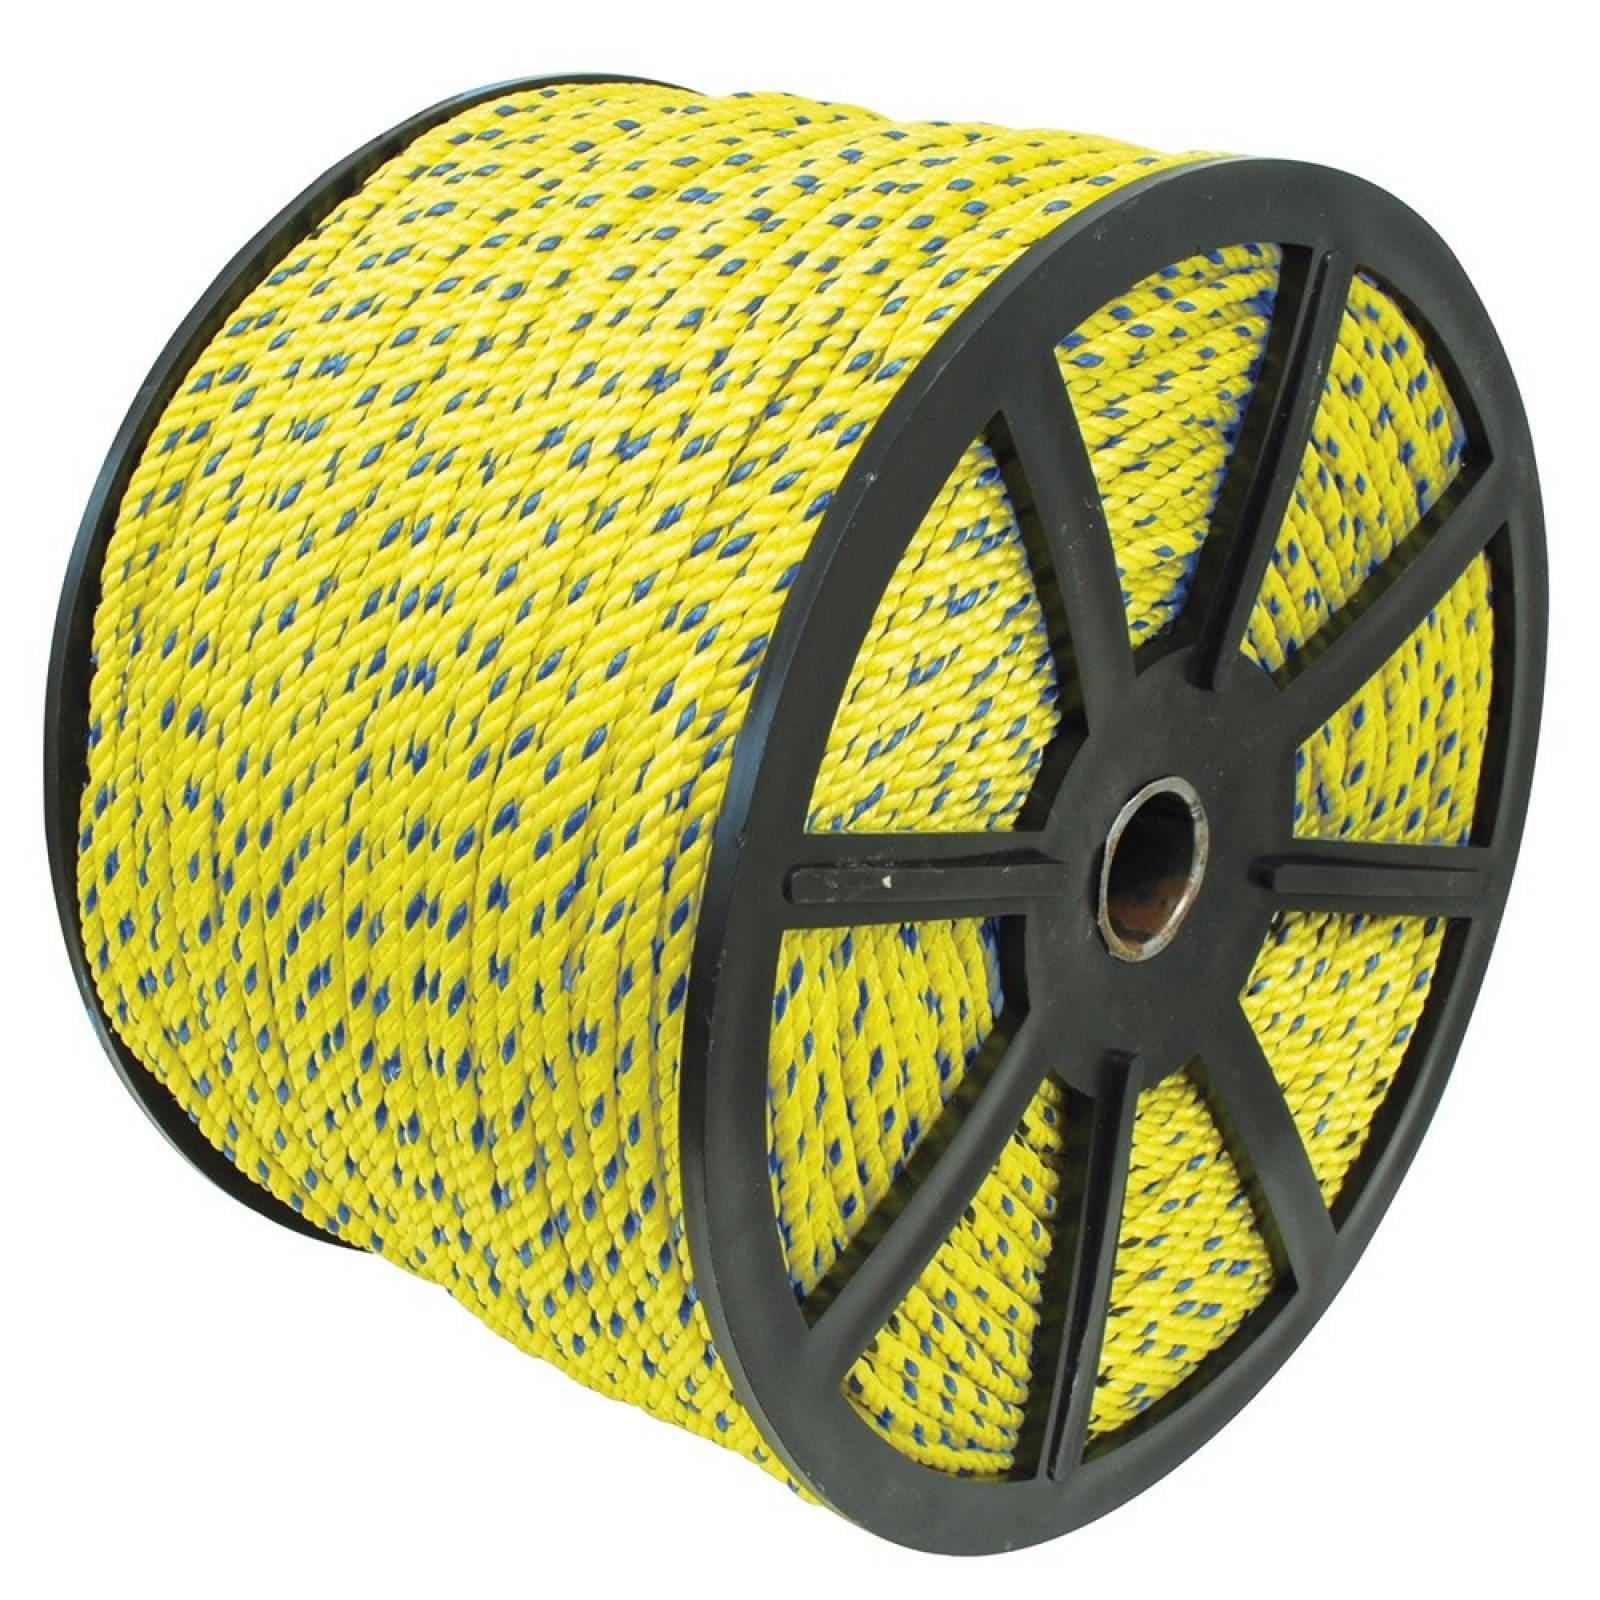 Cuerda de polipropileno 19 mm, 40 kg 138207 Surtek